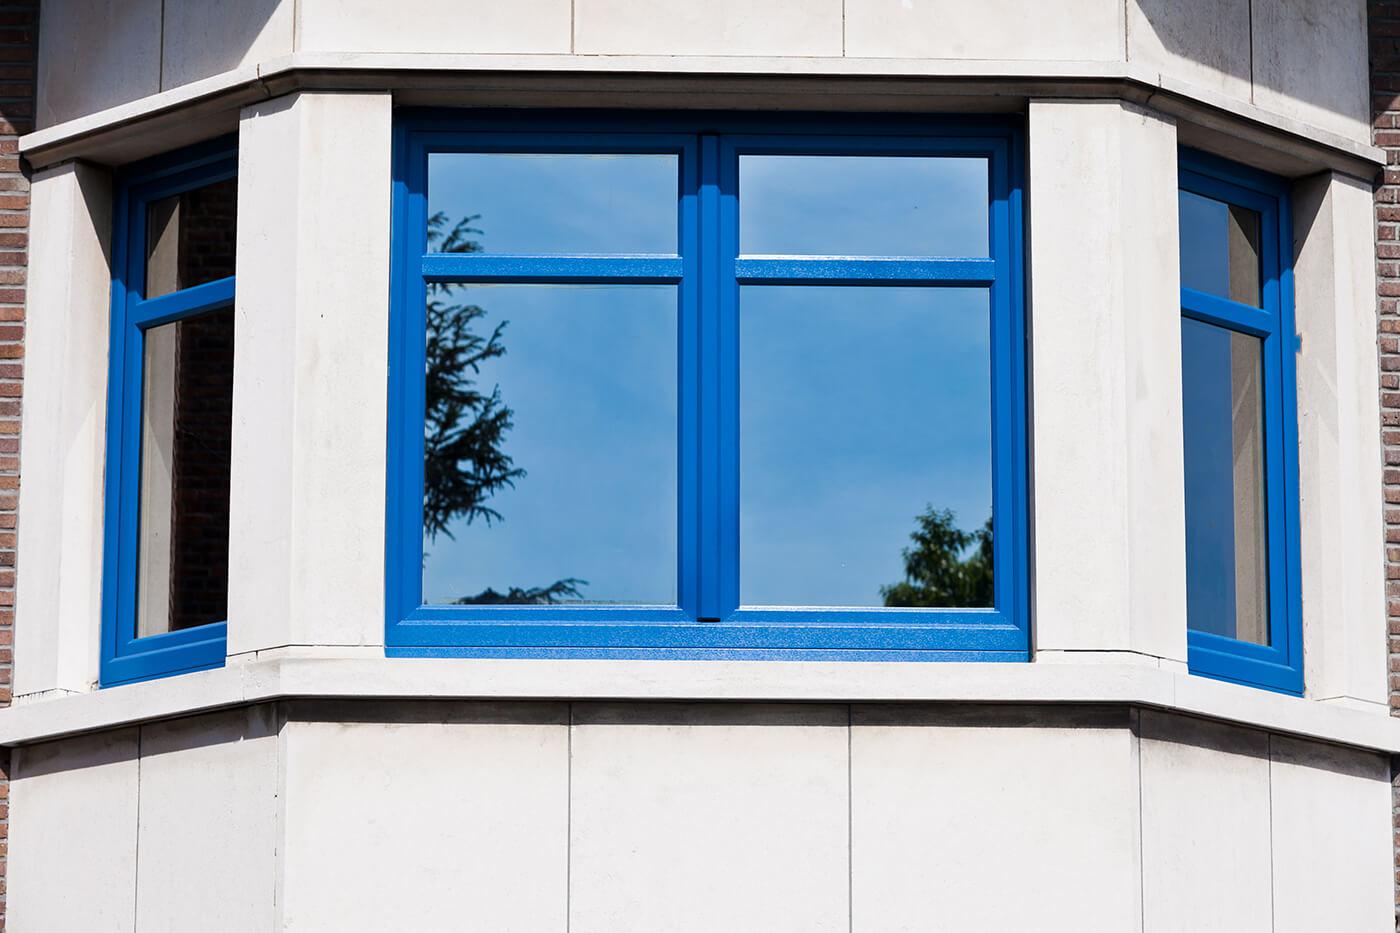 los angeles 7b311 6e215 PVC window - Raposo - Expert in installing PVC windows - Raposo